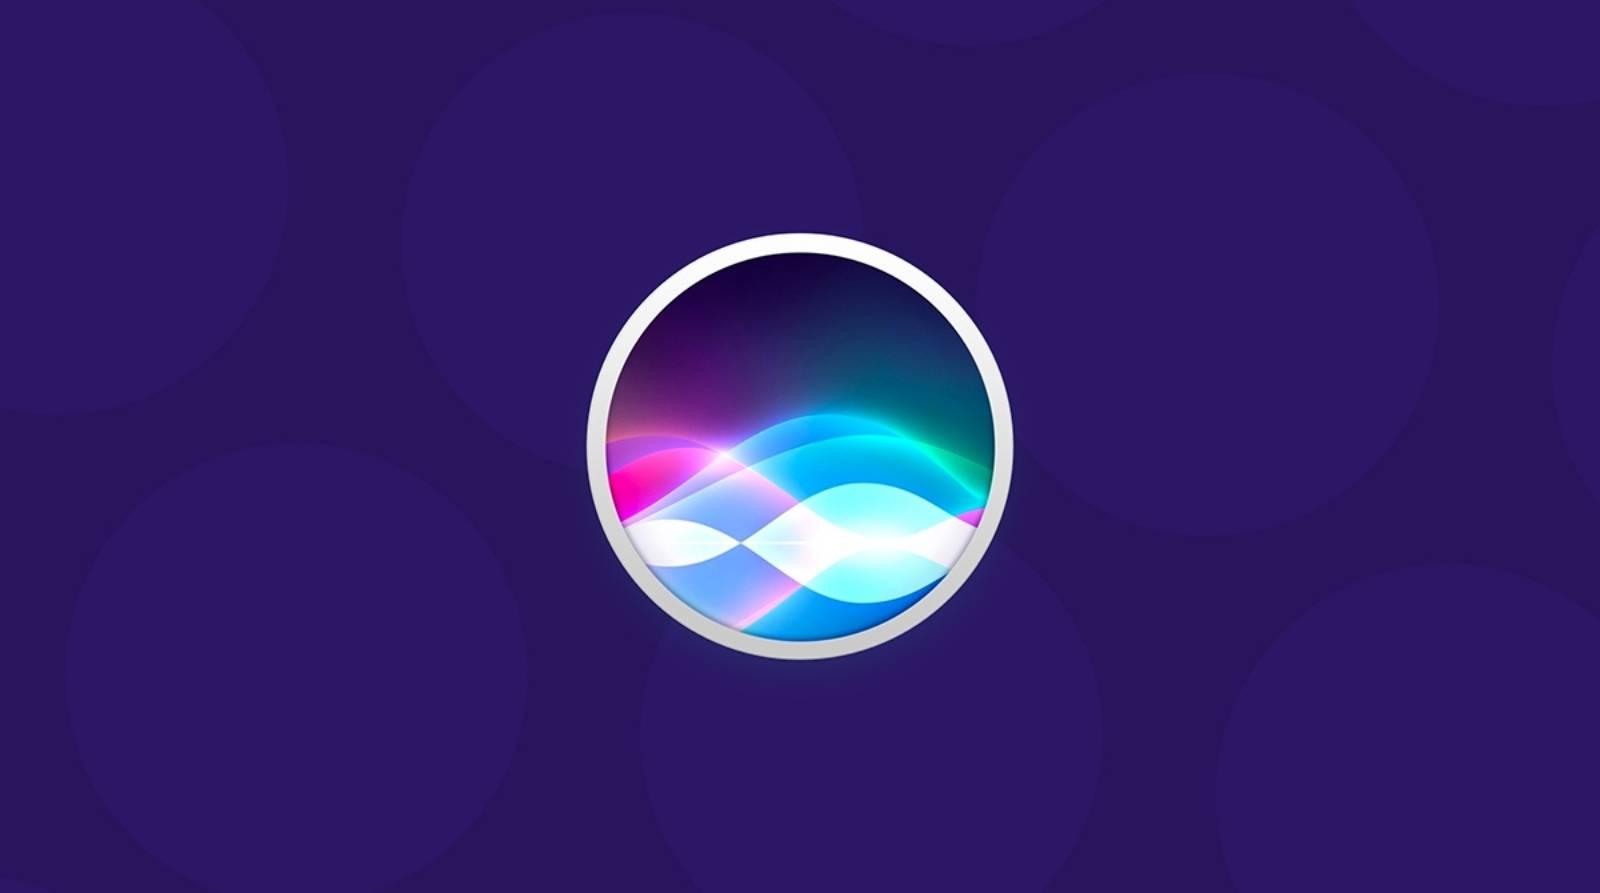 Siri Apple isi CERE SCUZE, dar CONTINUA sa ASCULTE Clientii